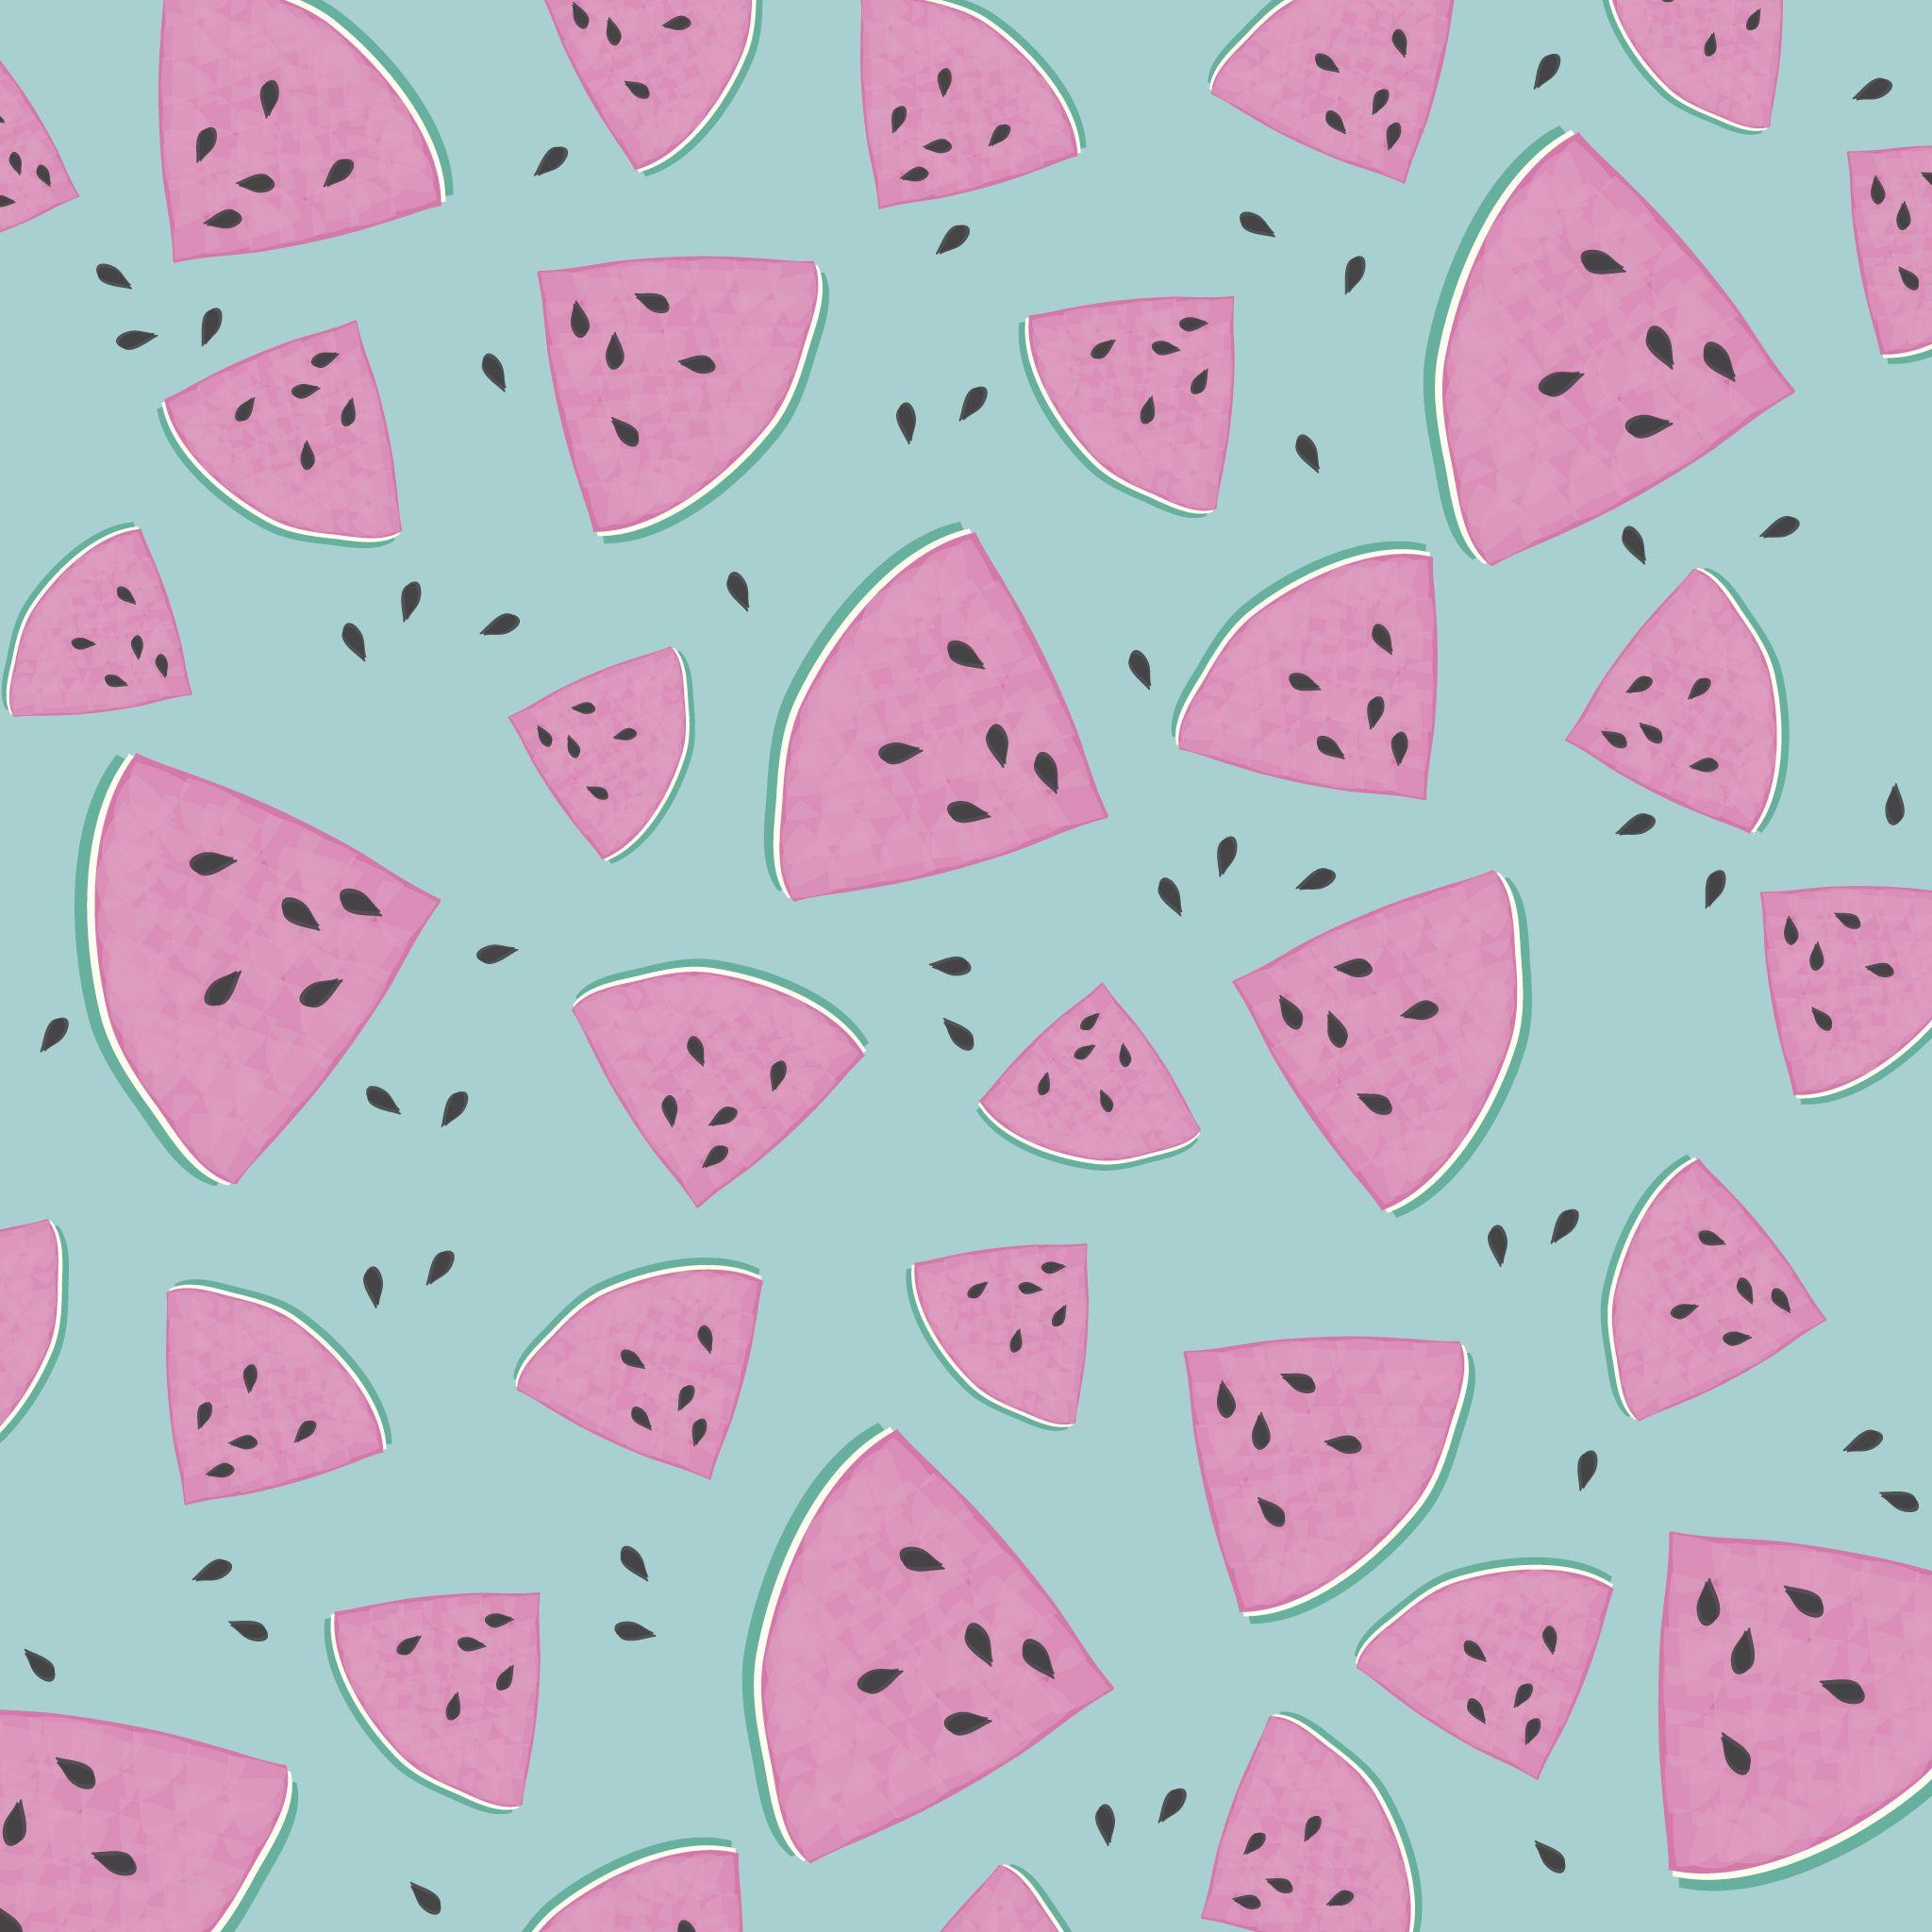 Cute Wallpapers For Ipad Wallpaper Pink Cute Cute Wallpapers